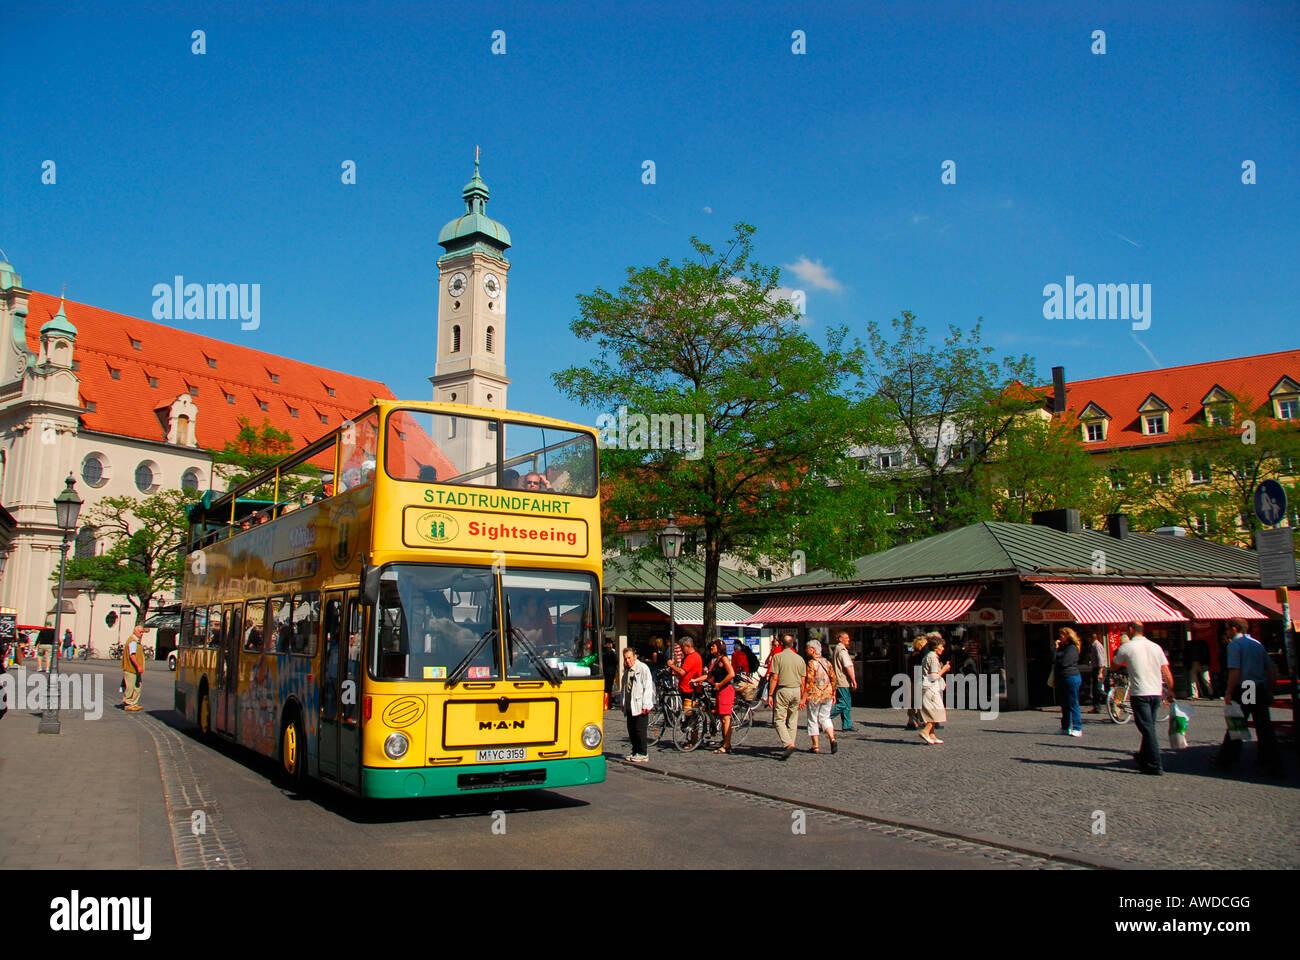 Tourist bus in front of Holy Ghost Church (Heilig-Geist-Kirche) at Viktualienmarkt, Munich, Bavaria, Germany Stock Photo